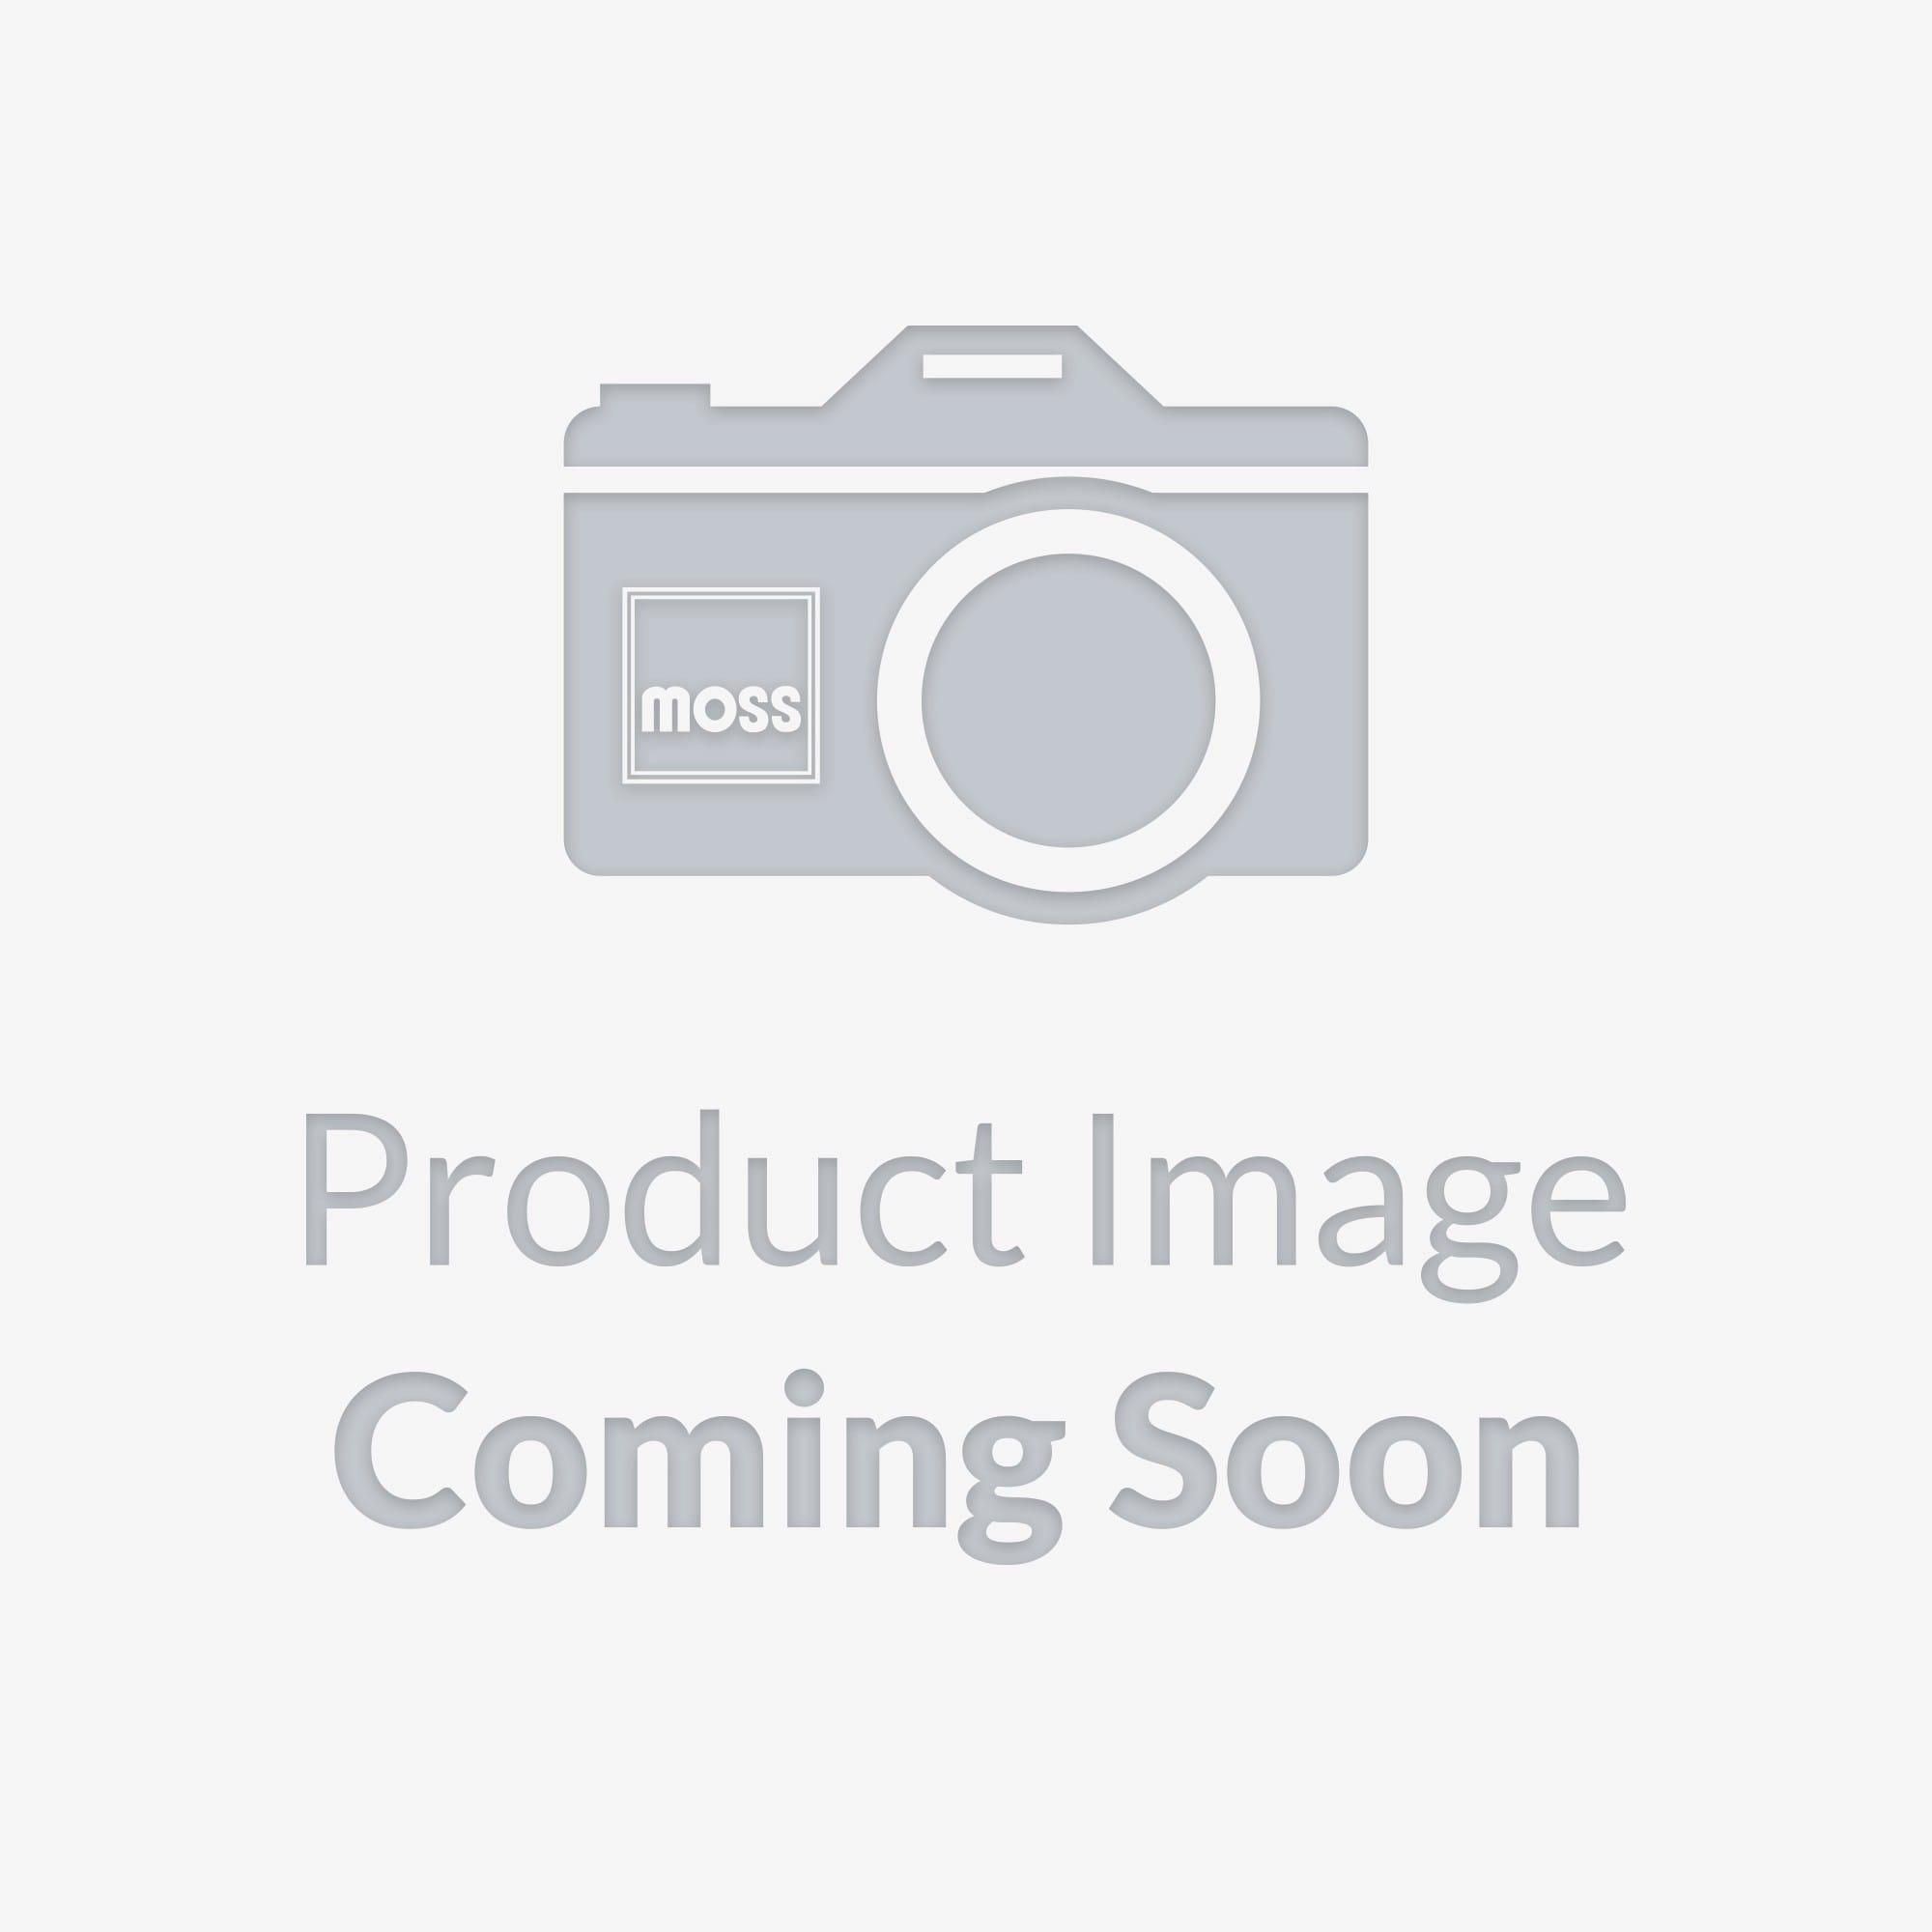 hs4 manifold and air filter assembly intake manifold fuel 71 Pontiac Grand Safari Wagon hs4 manifold and air filter assembly